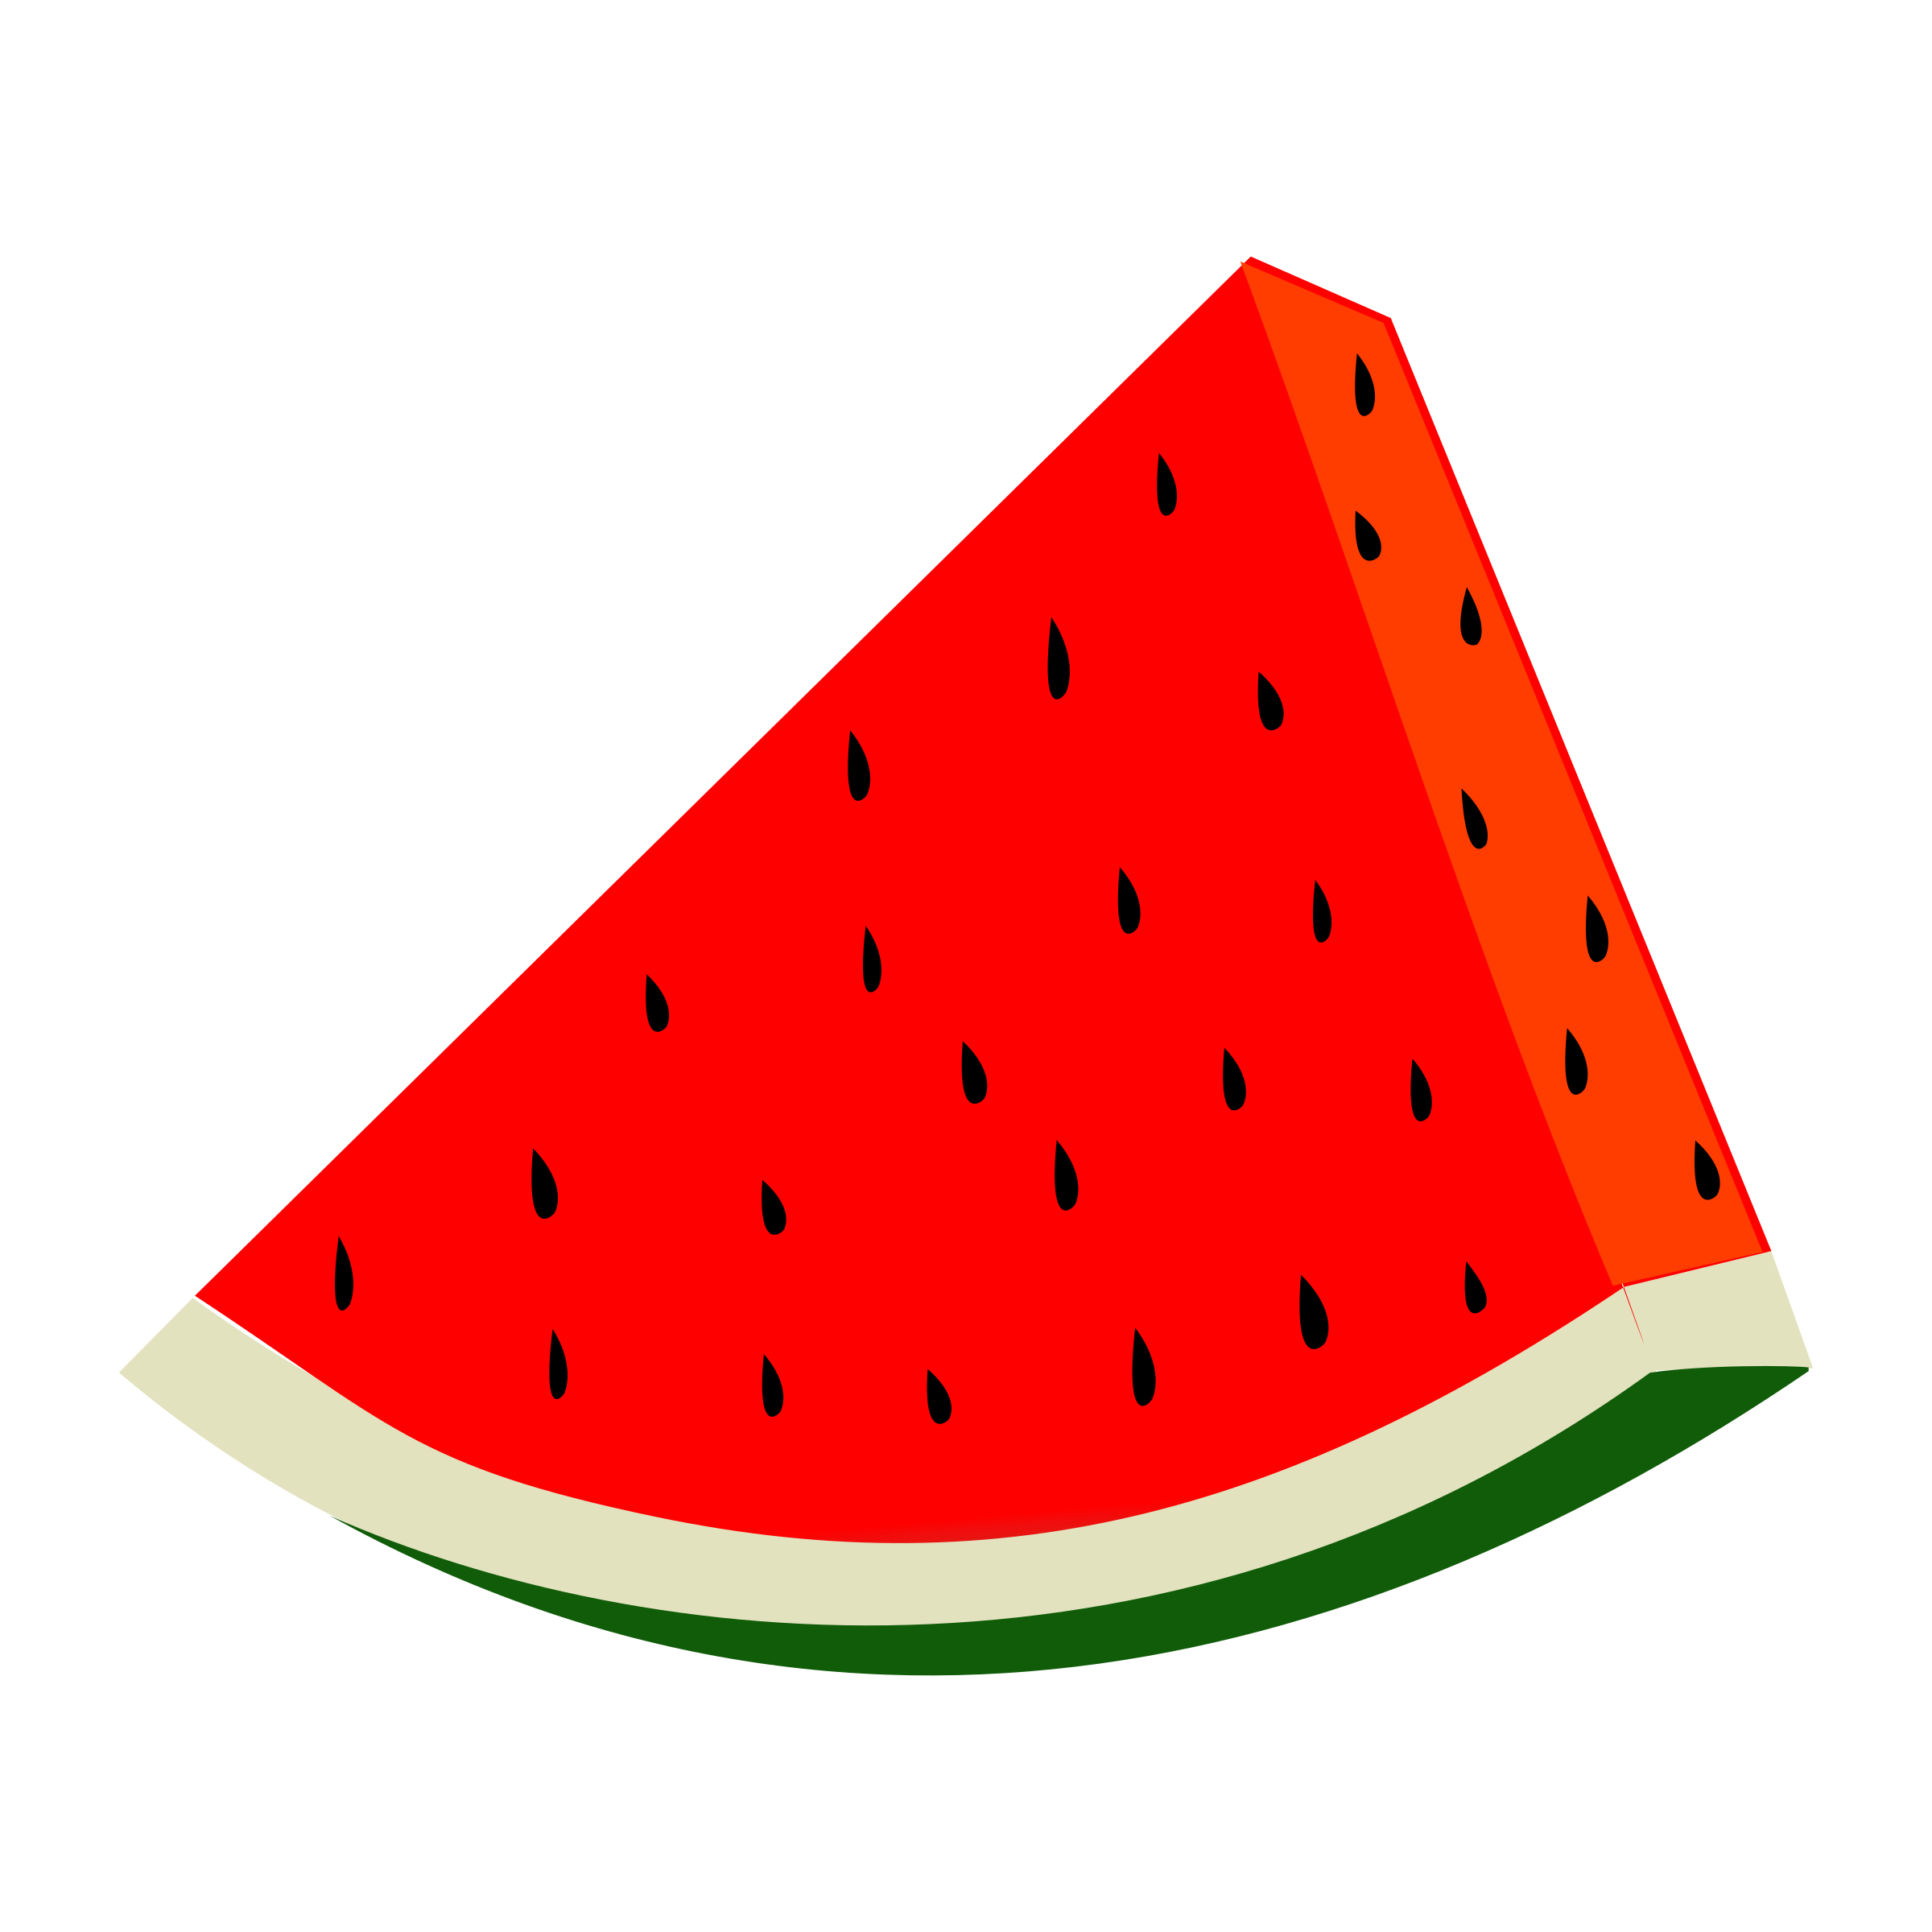 Watermelon vector clipart image.